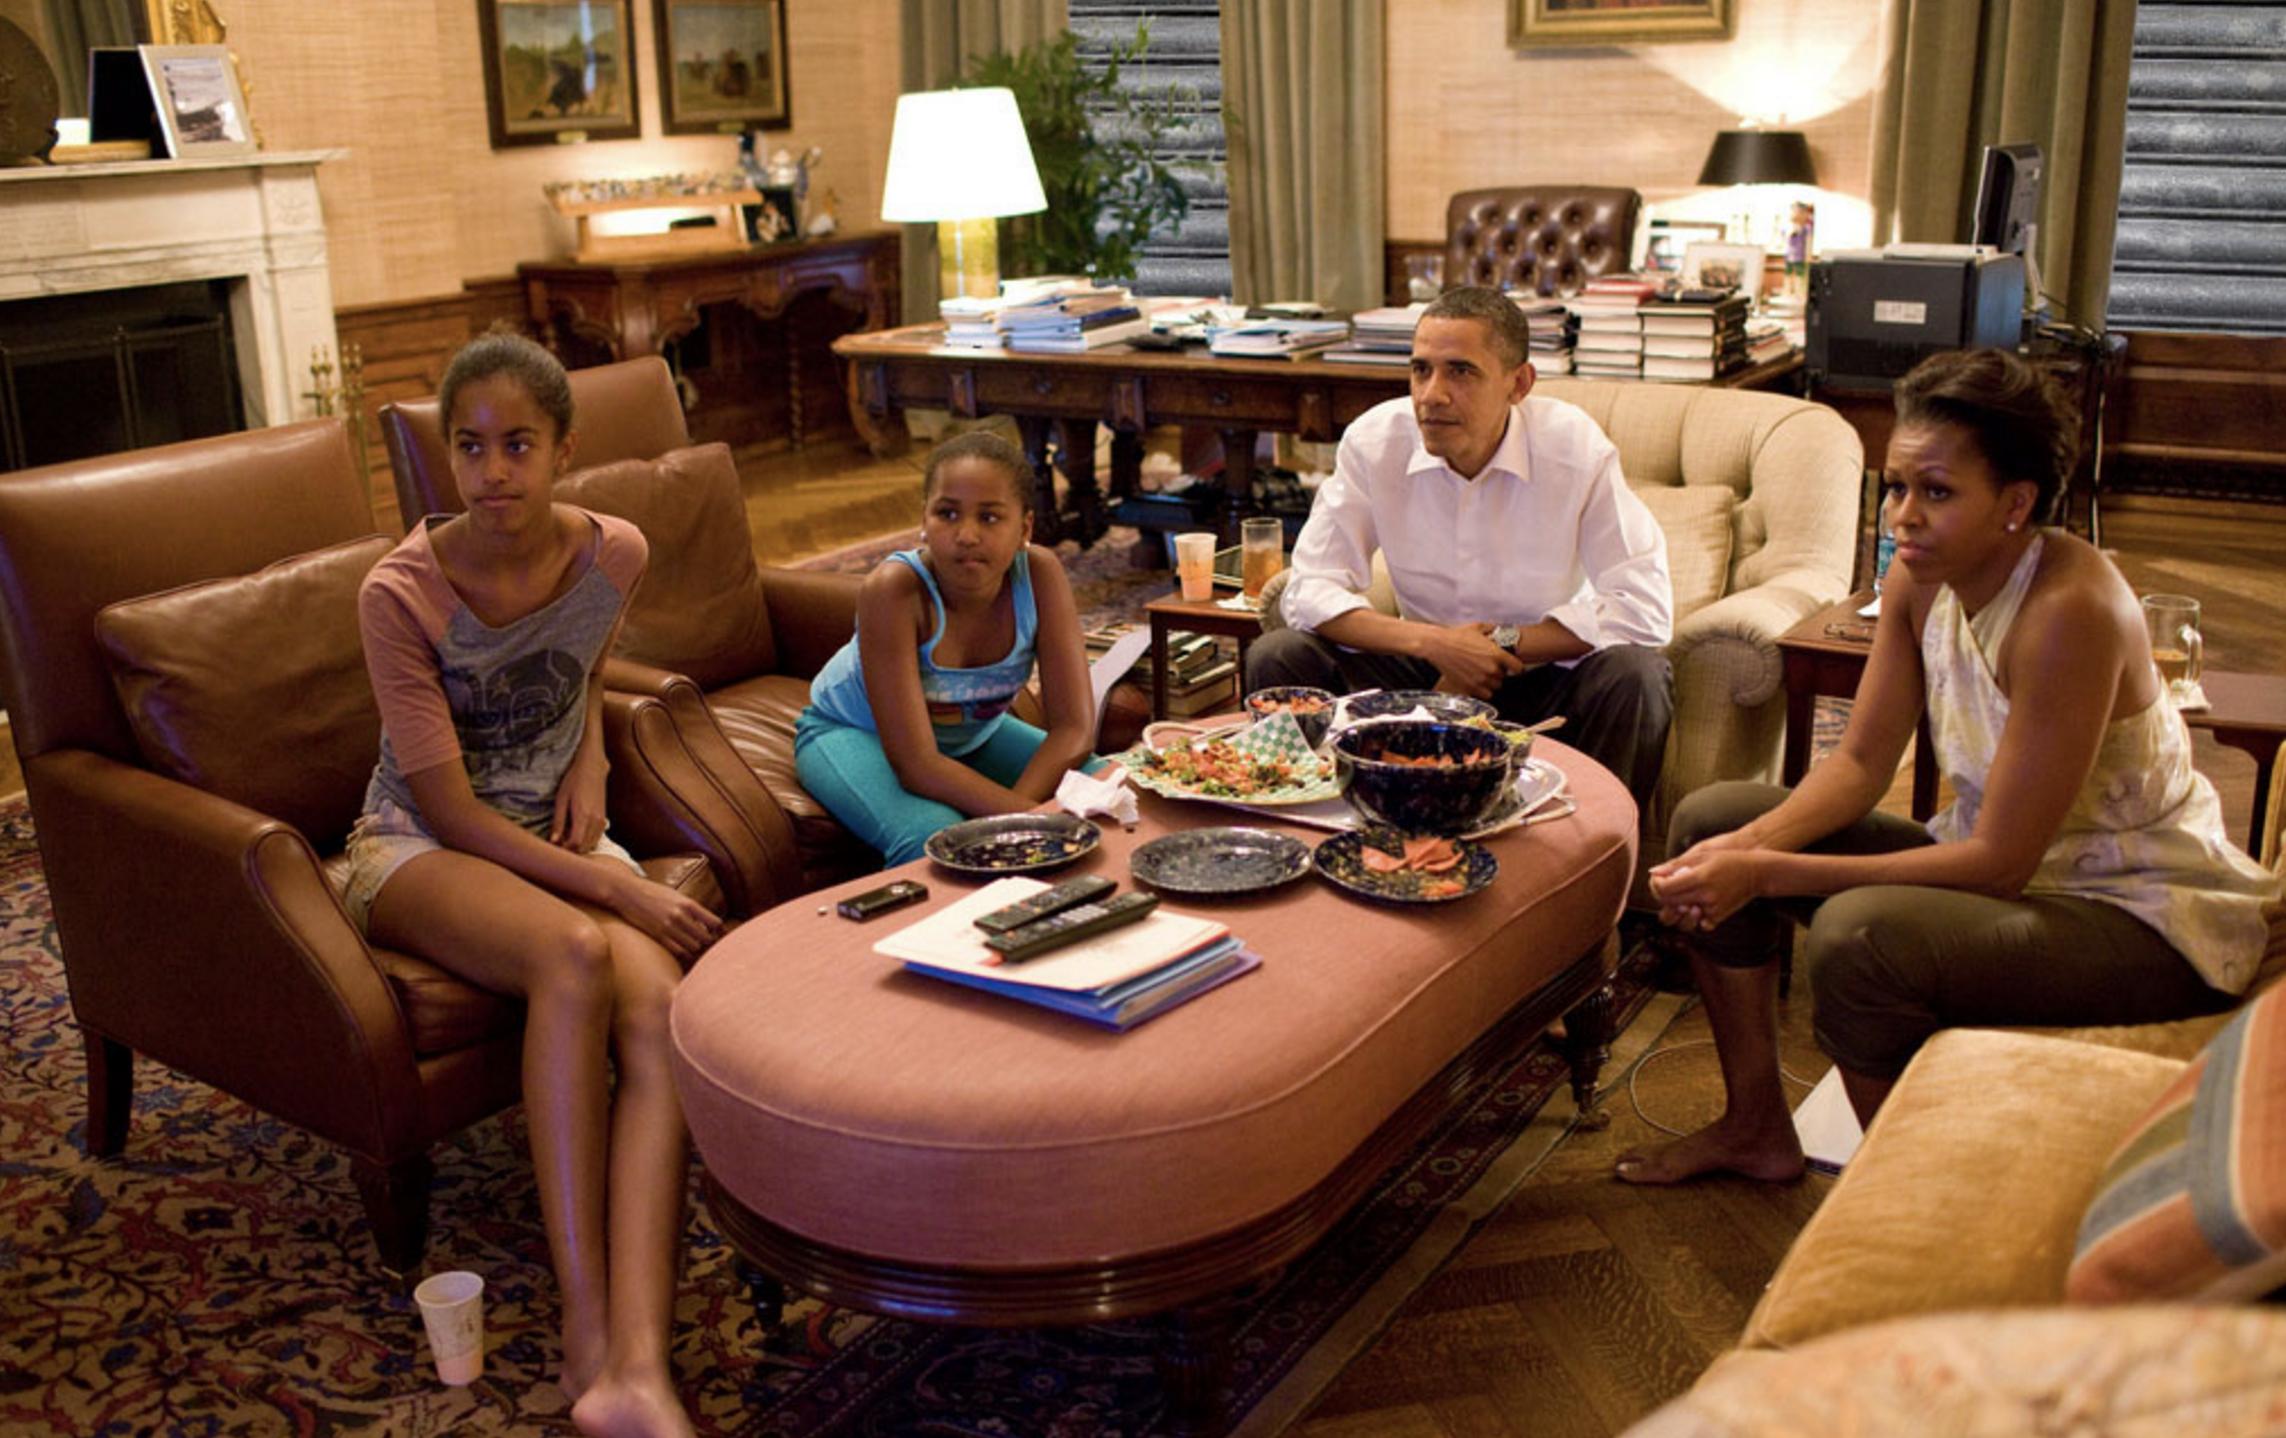 Pete Souza / White House